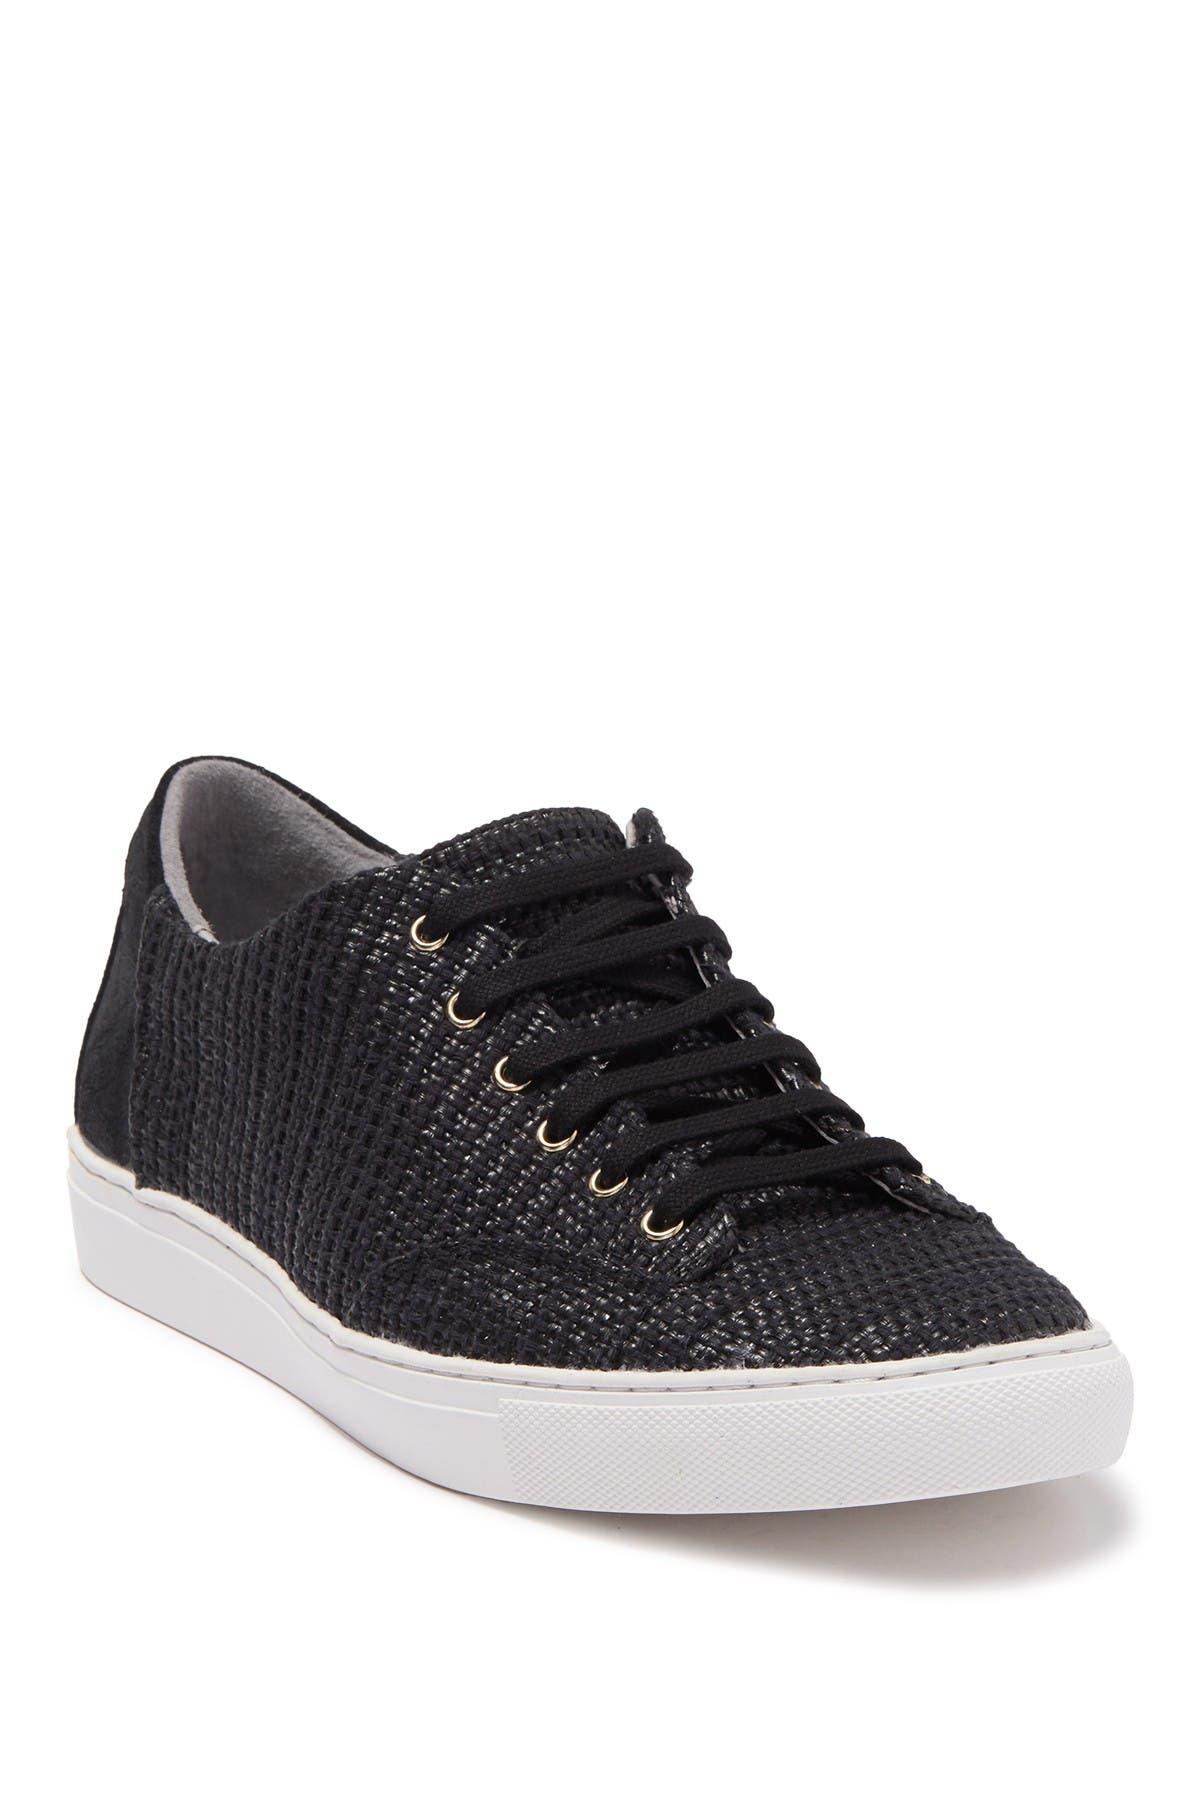 Image of TCG Creuzot Woven Sneaker